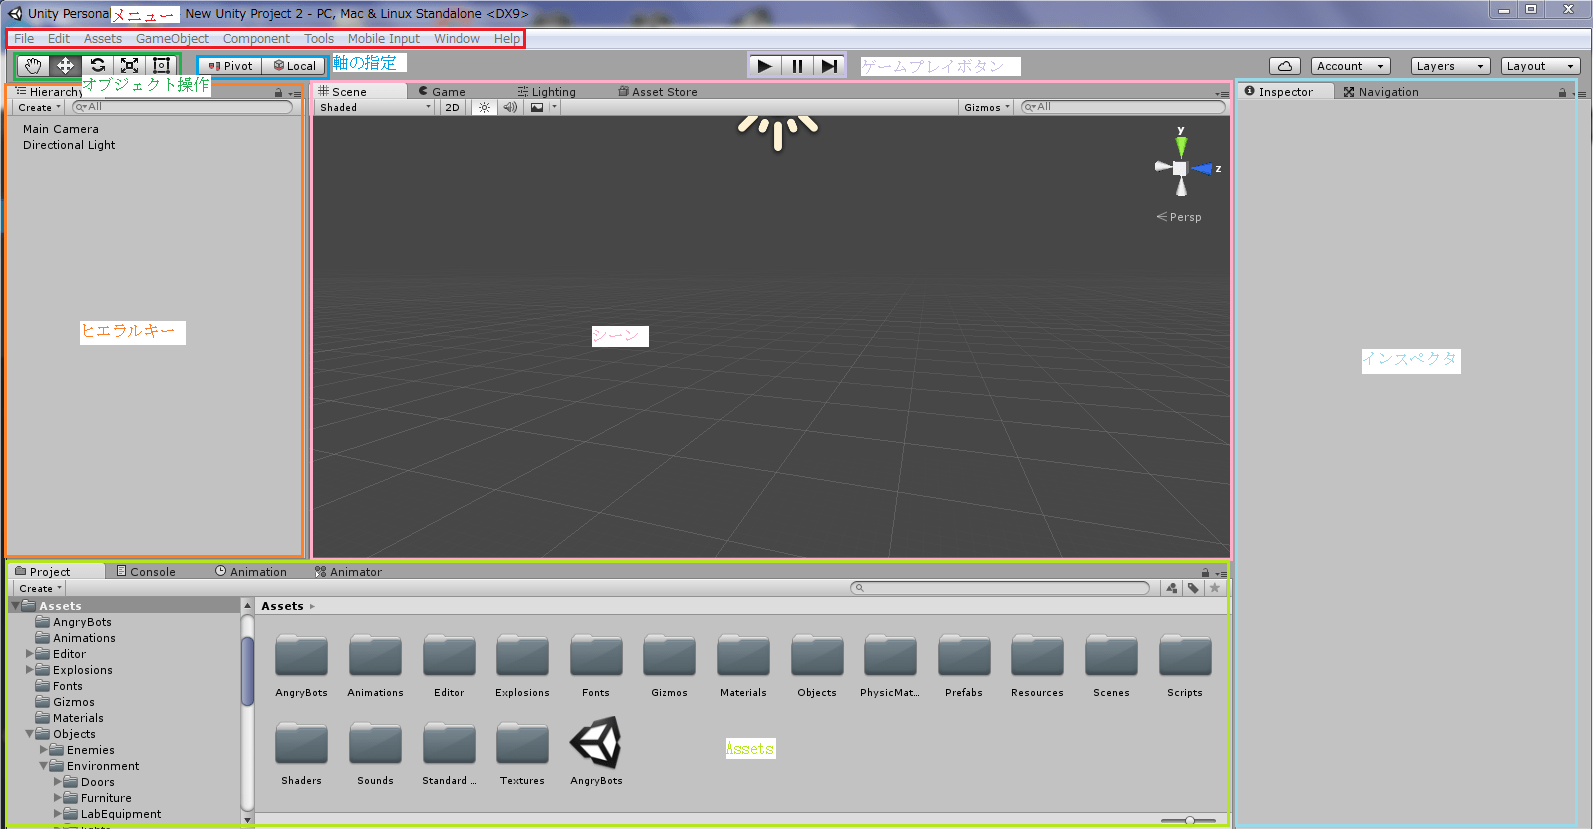 Unityメイン画面